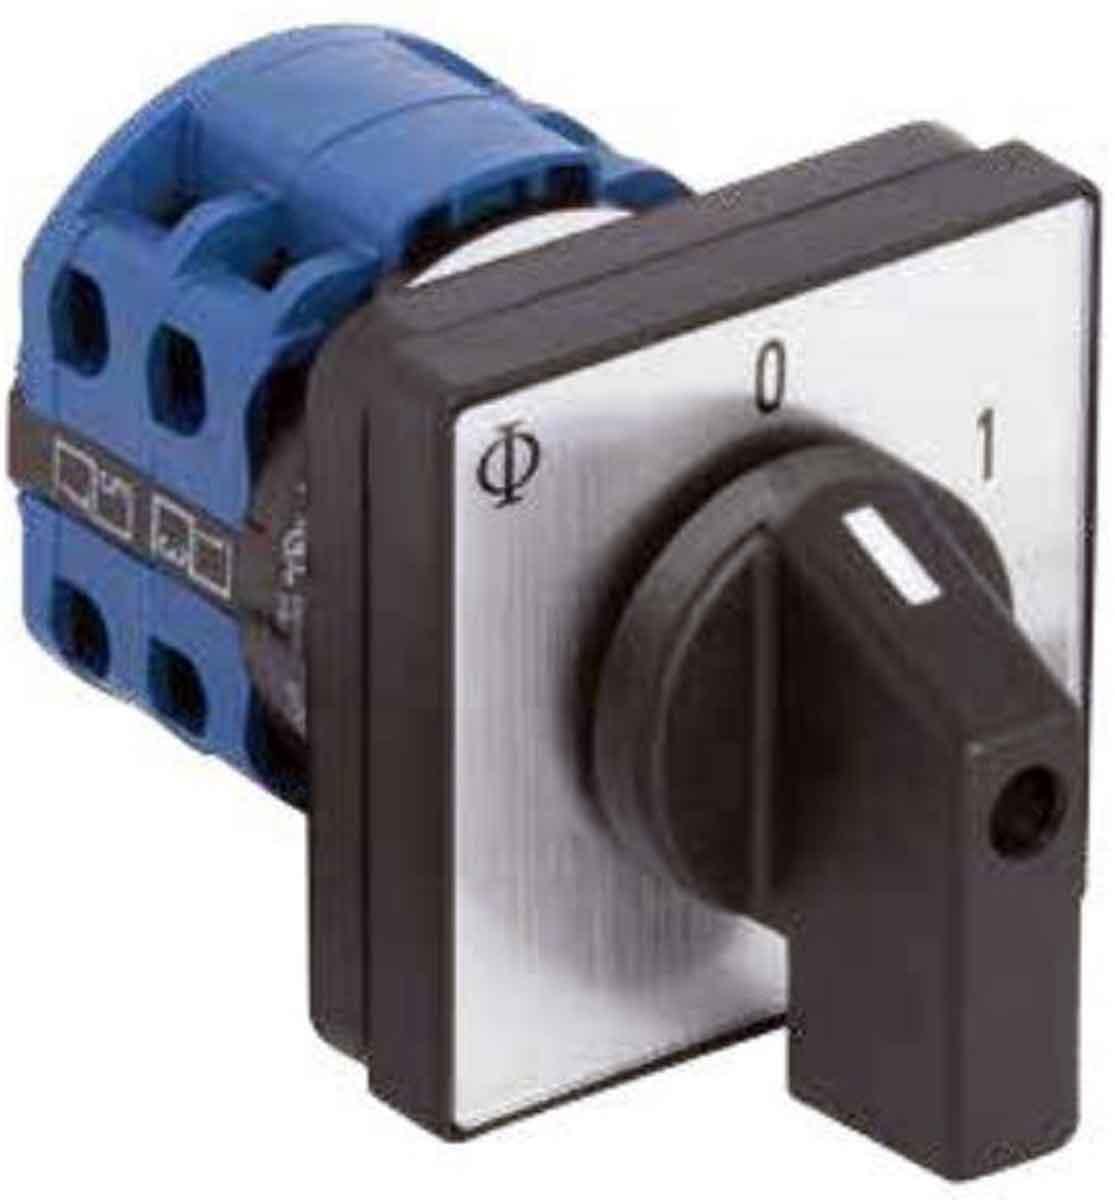 Chave comutadora de três calores para autoclave vertical